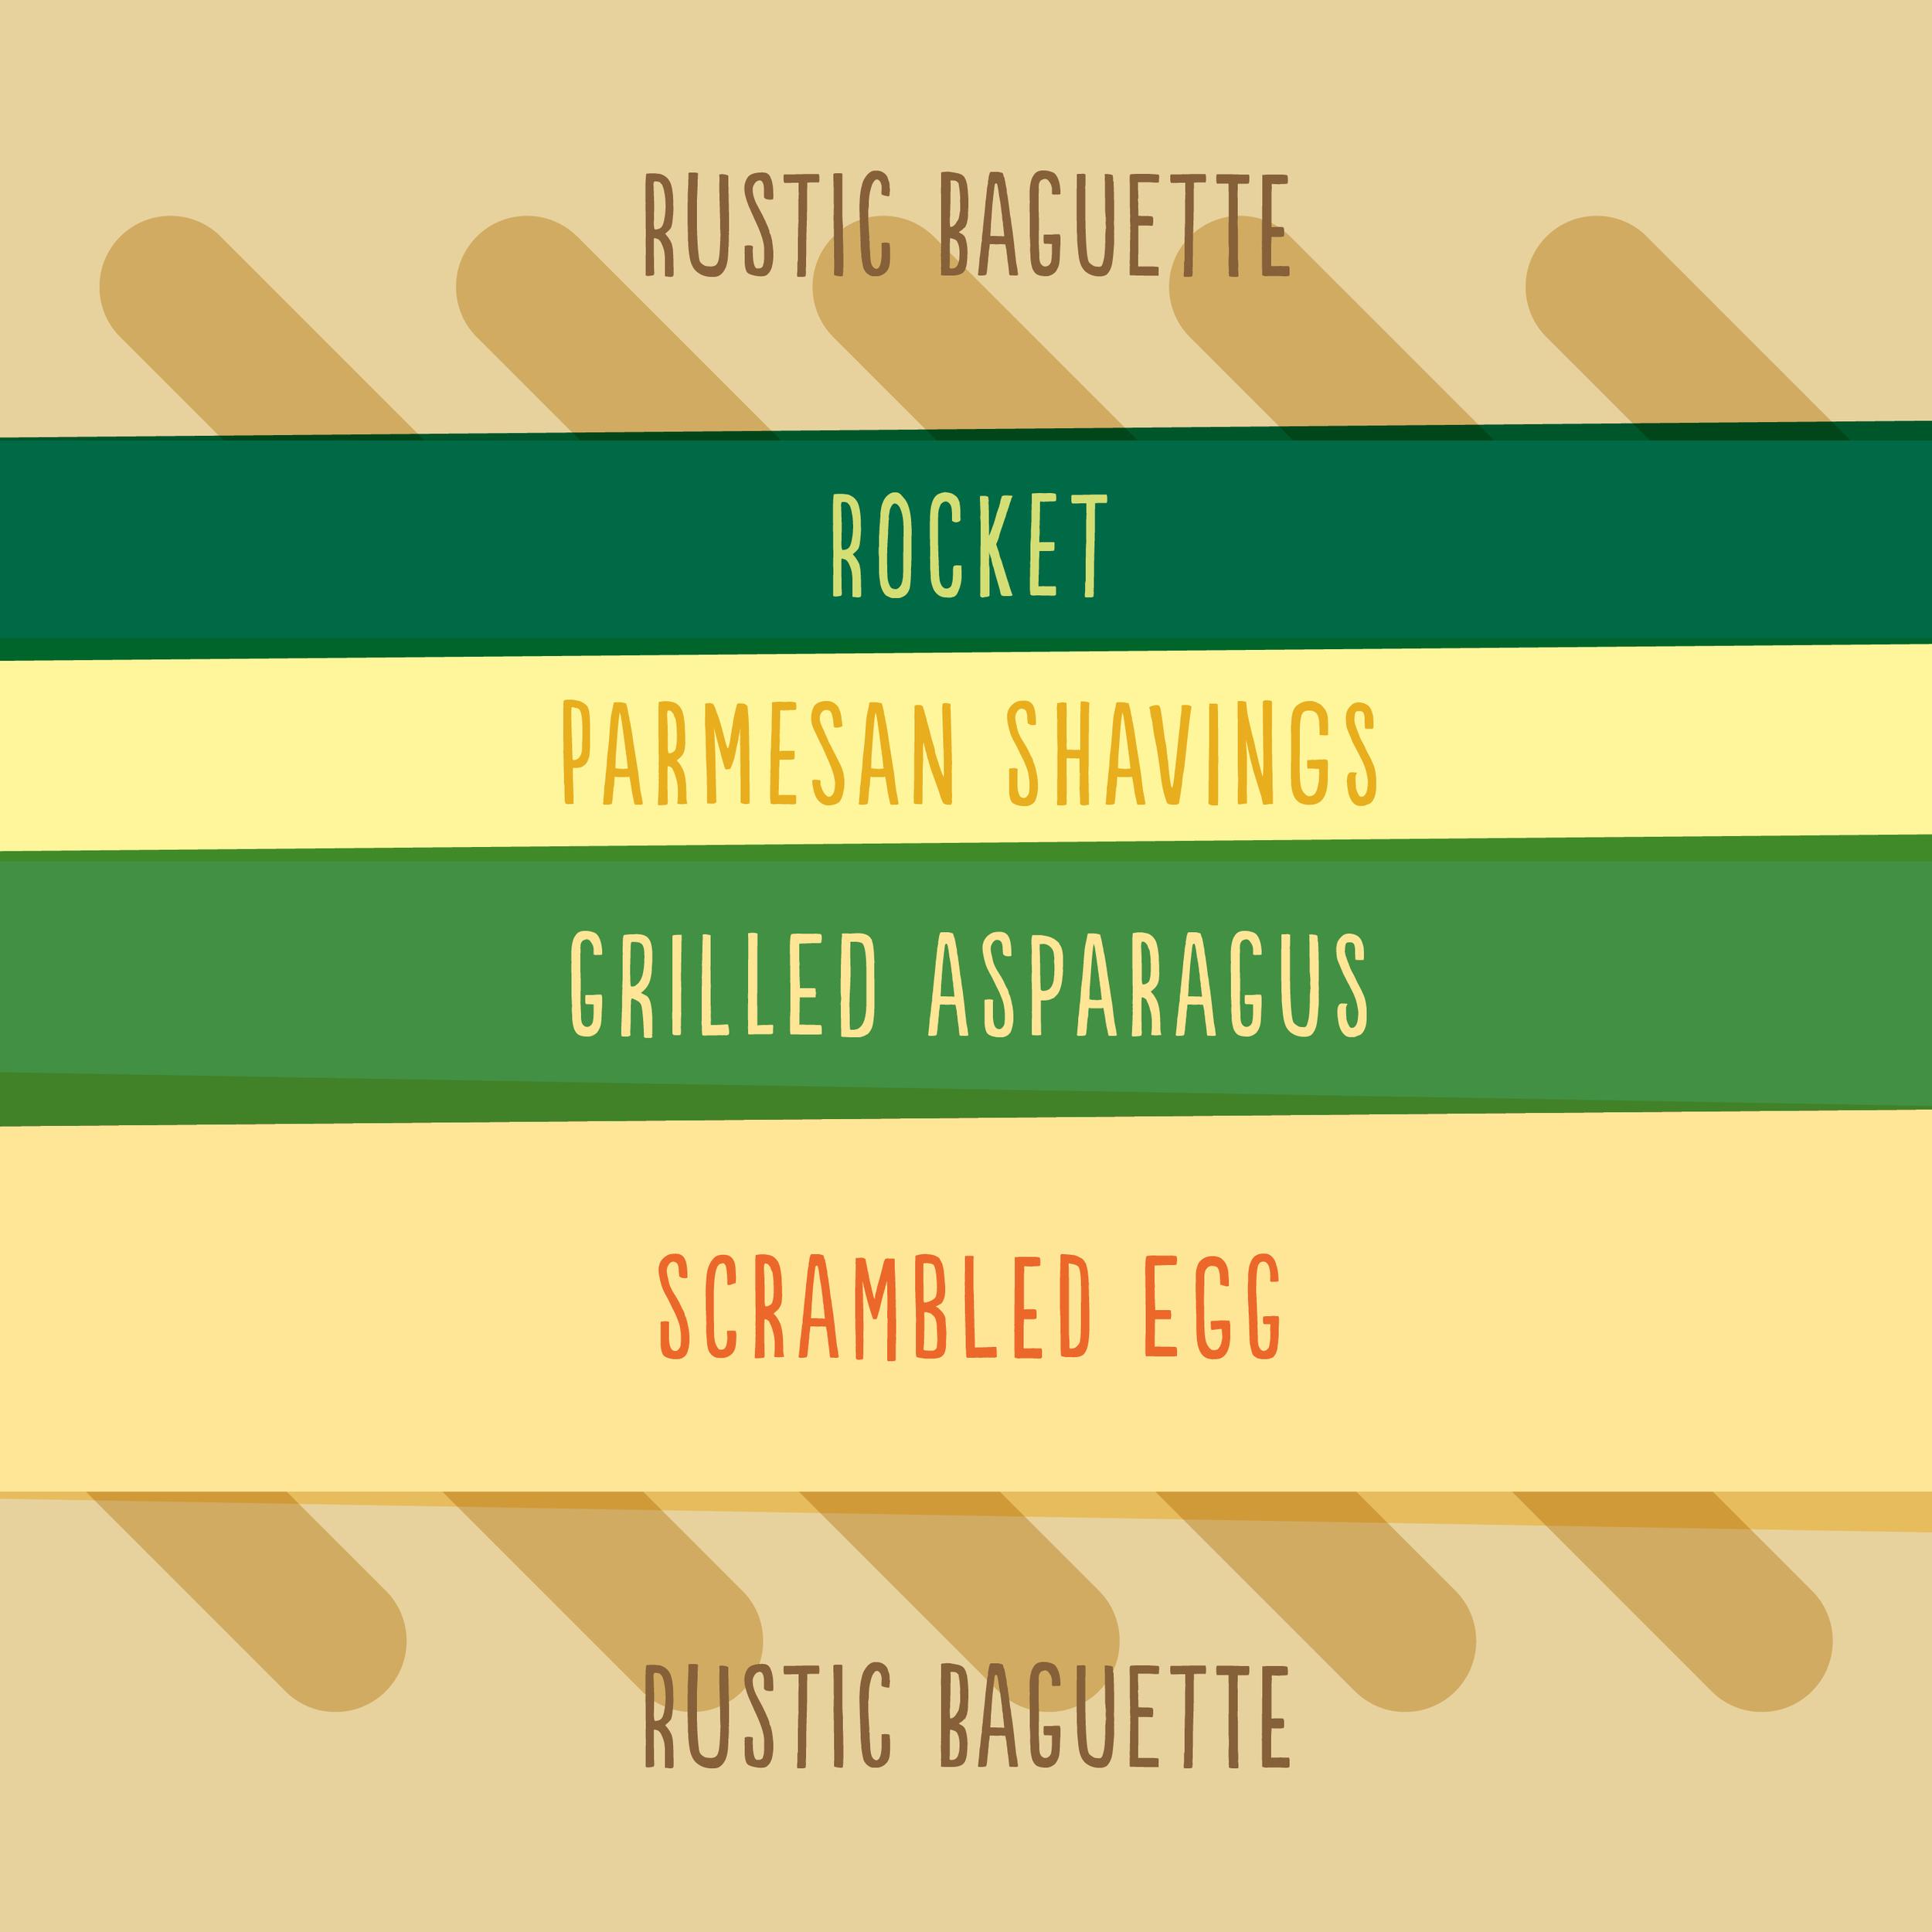 Scrambled-egg-asparagus-baguette.jpg